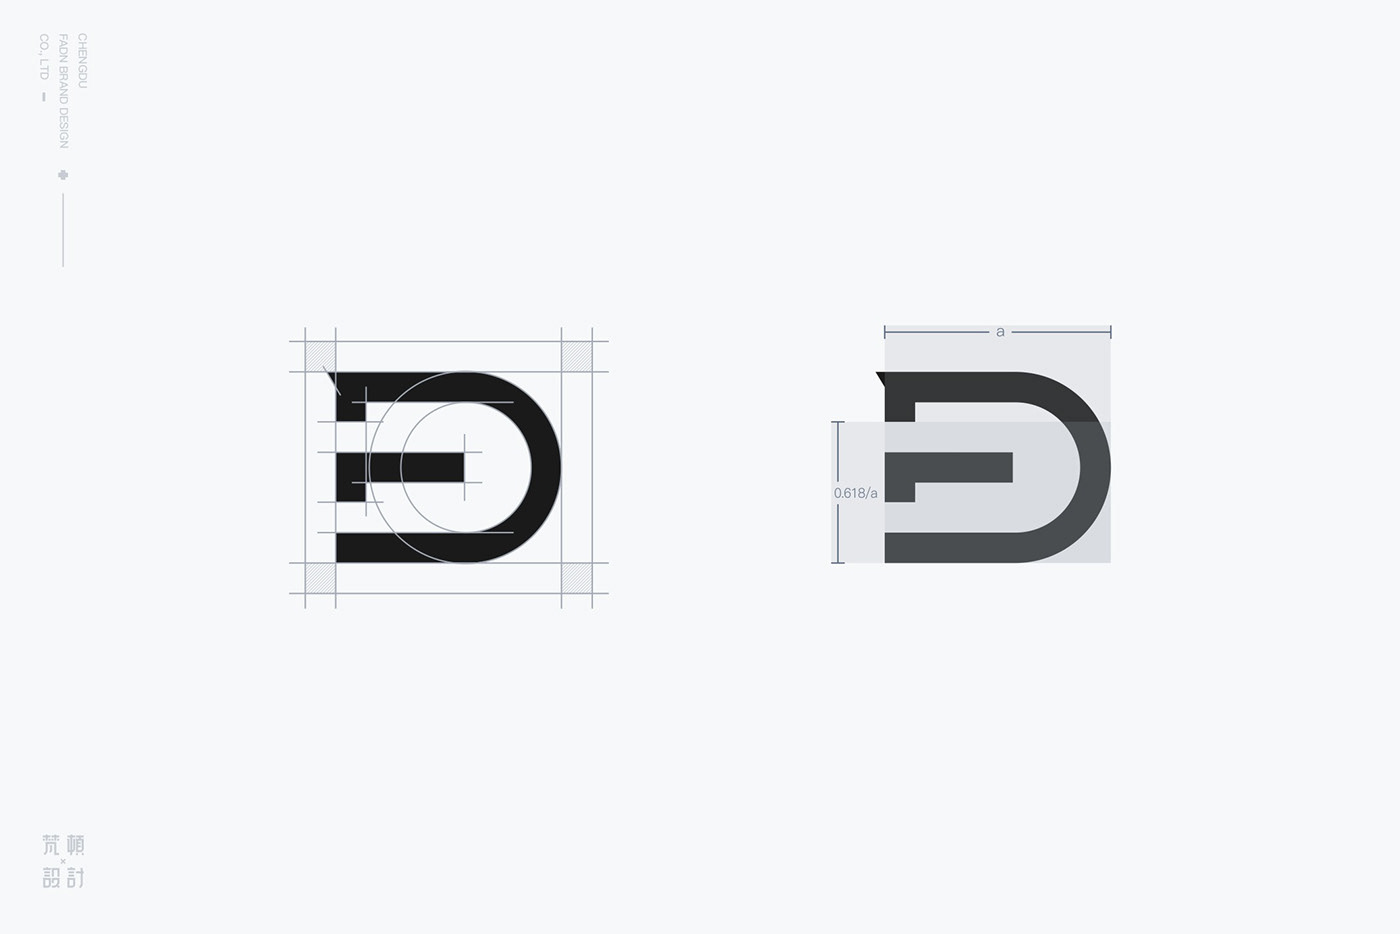 梵顿设计 fadn VI vis VI Design 品牌设计 Brand Design Brand VI Enterprise VI animation